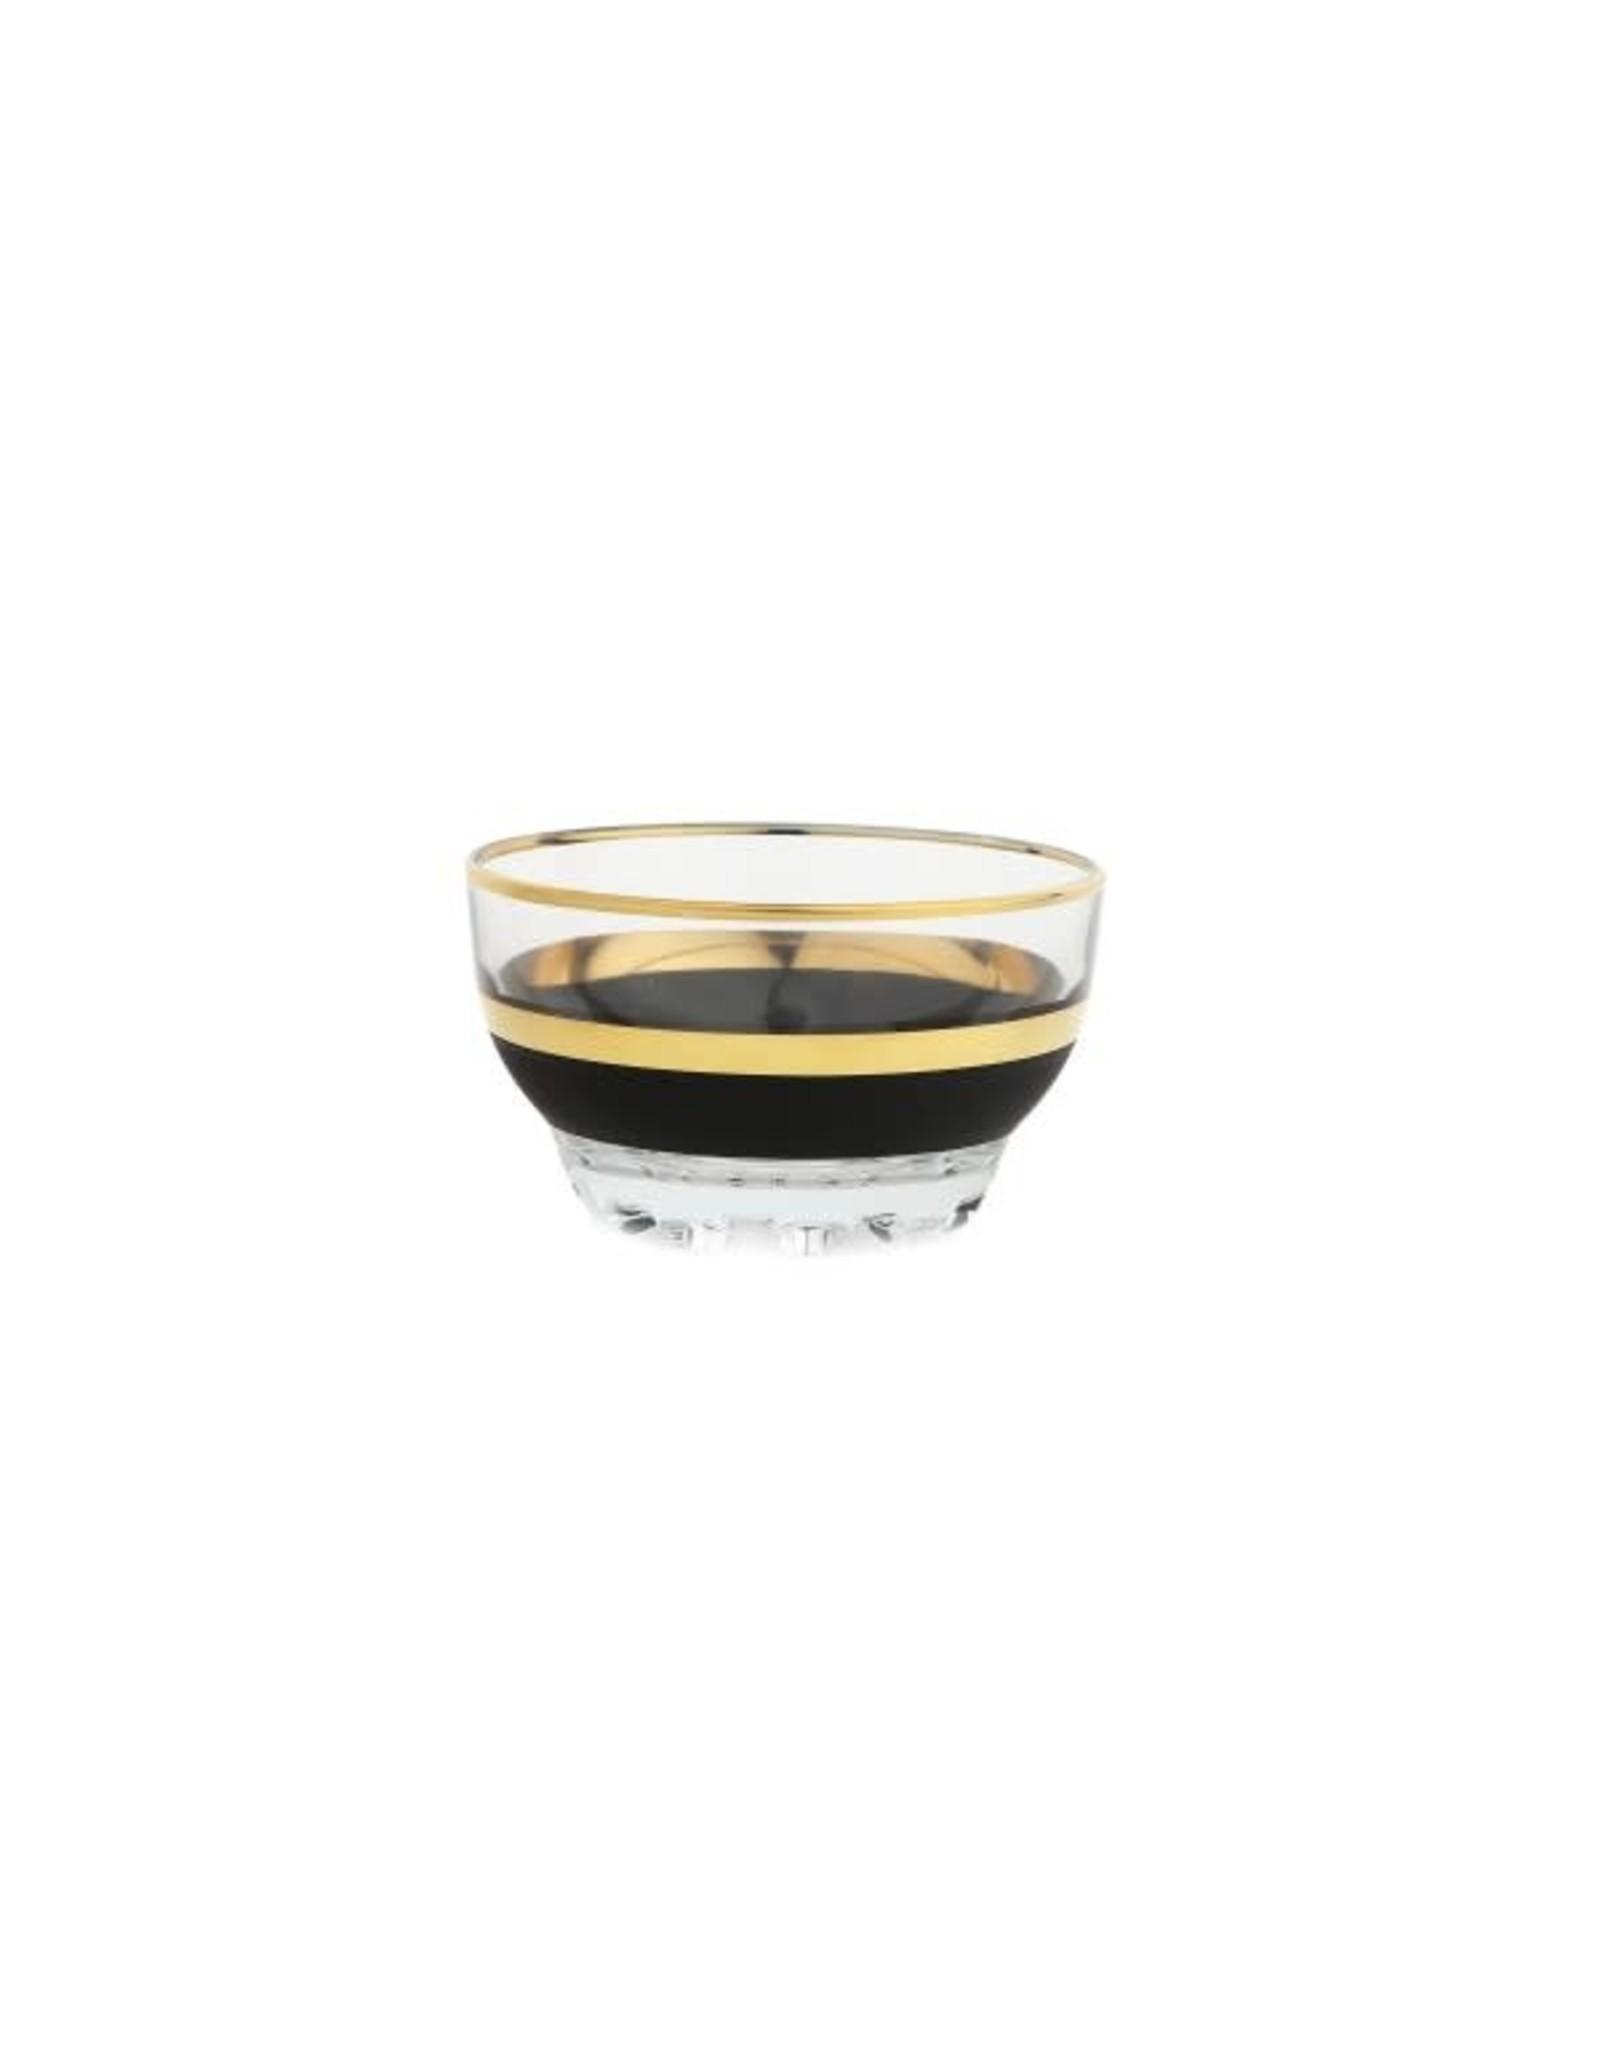 GDB2057 Black & Gold Design Dessert Bowl